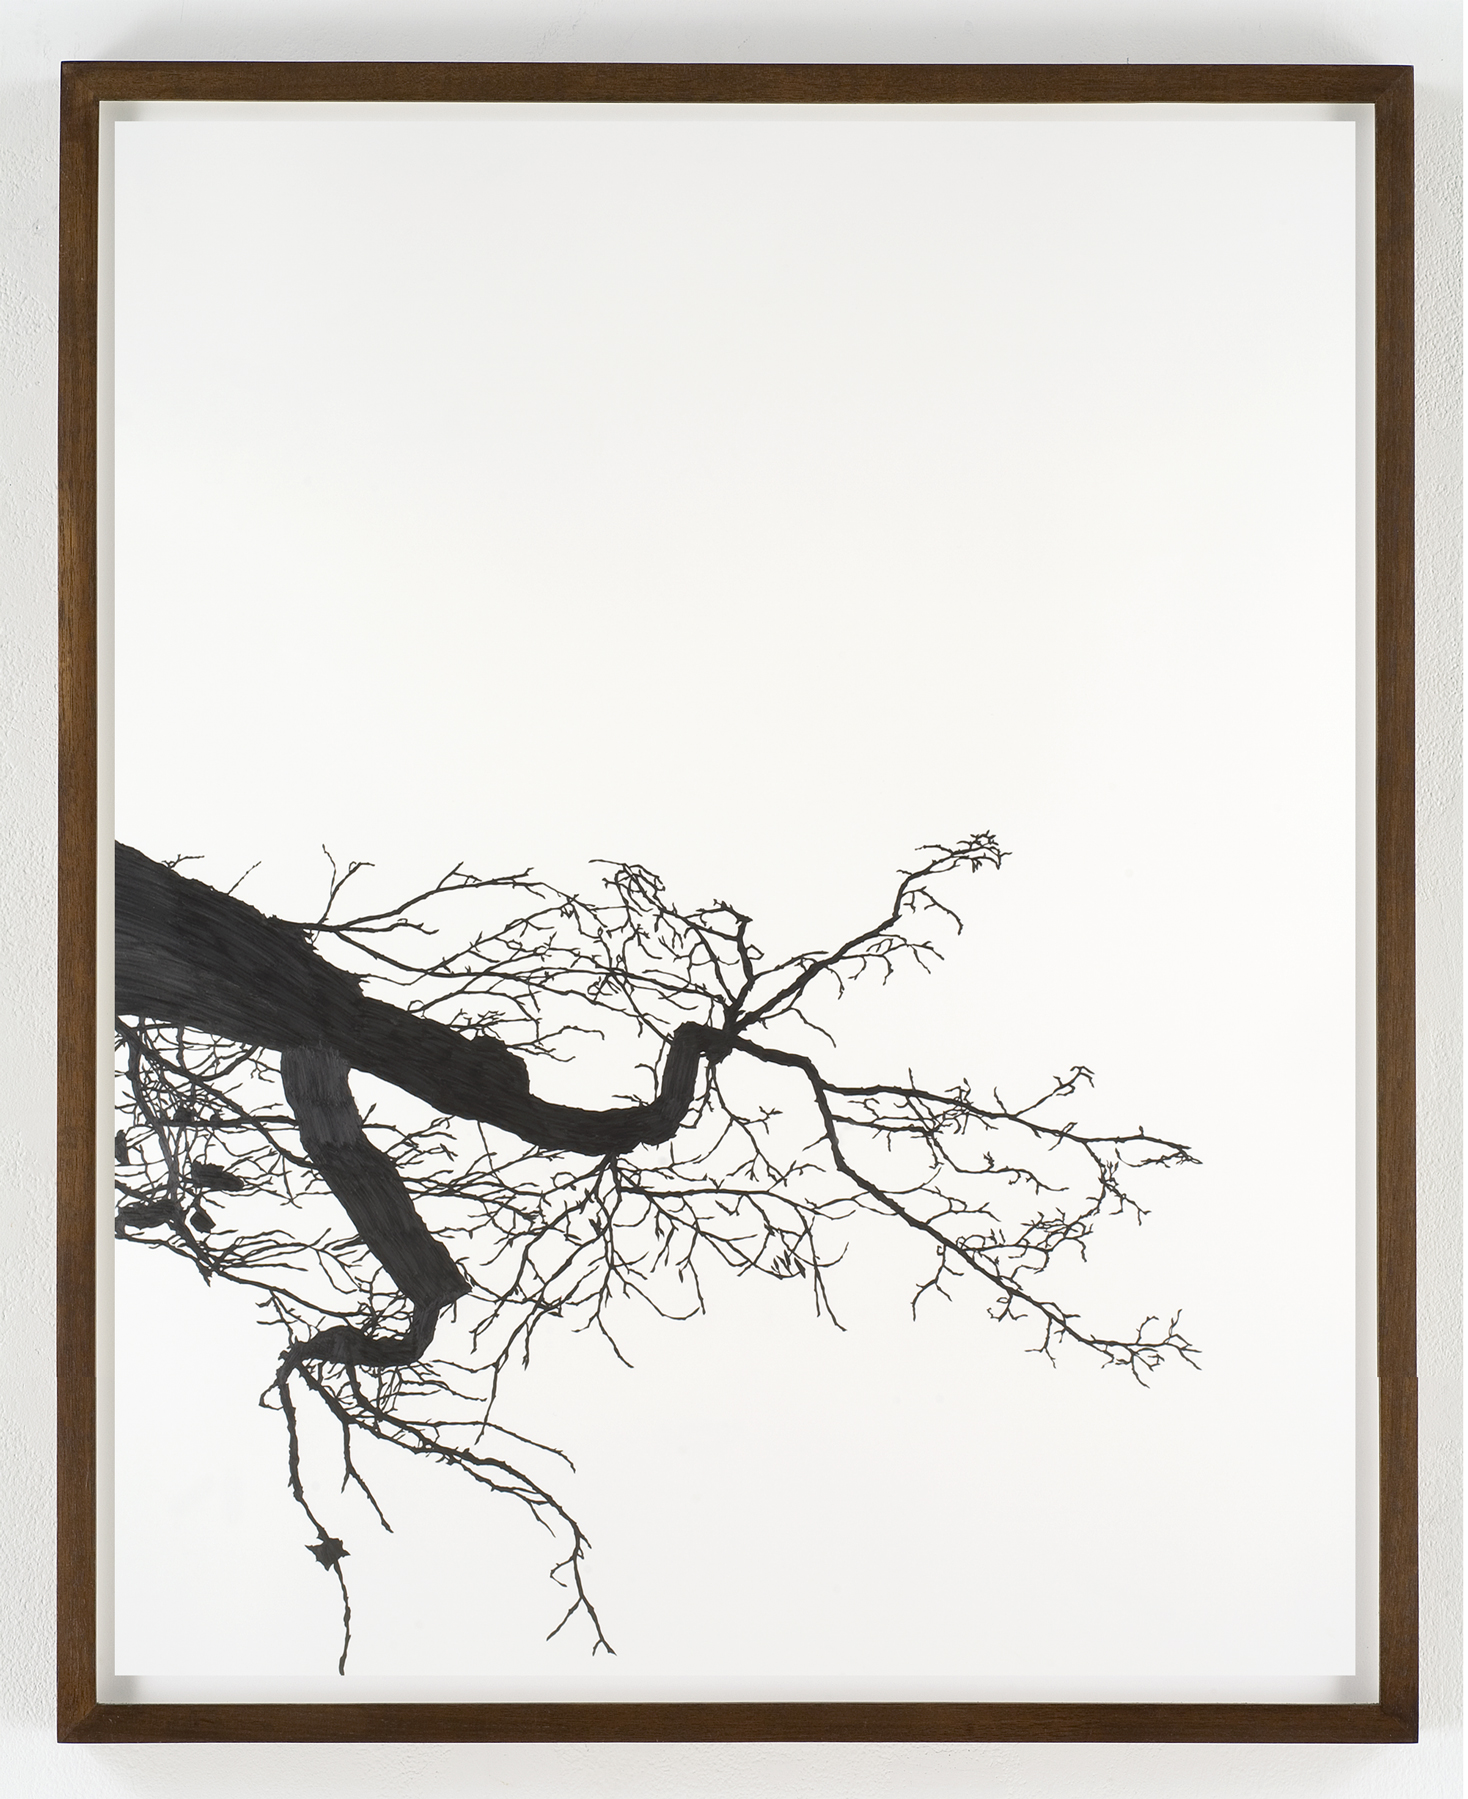 "Meghan Gerety, 2008 Pencil on watercolor paper 60"" x 40"" framed in dark walnut"